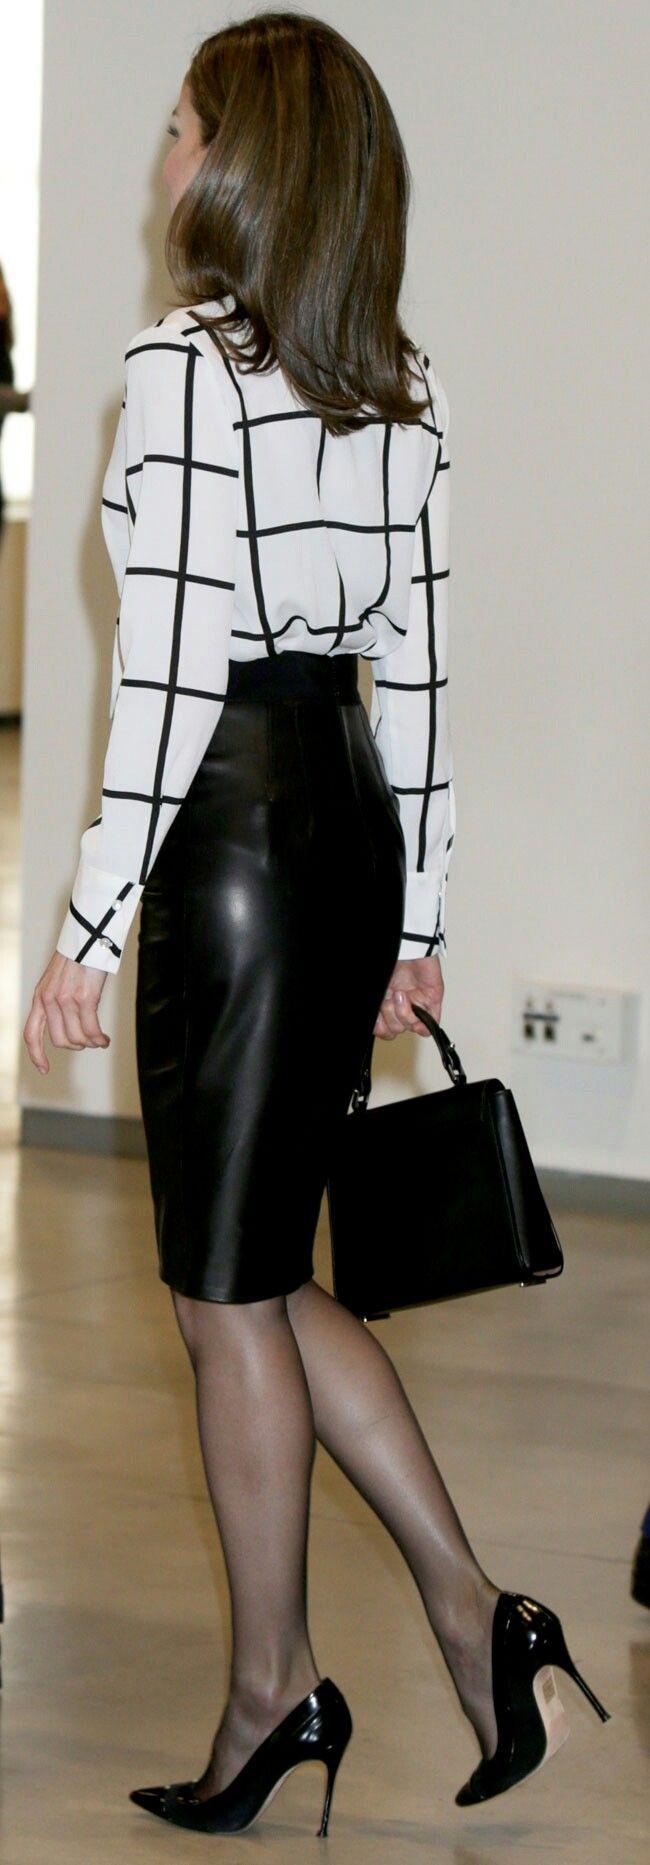 Queen Letizia - Roberto Verino blouse - Hugo Boss skirt + bag - Carolina Herrera pumps